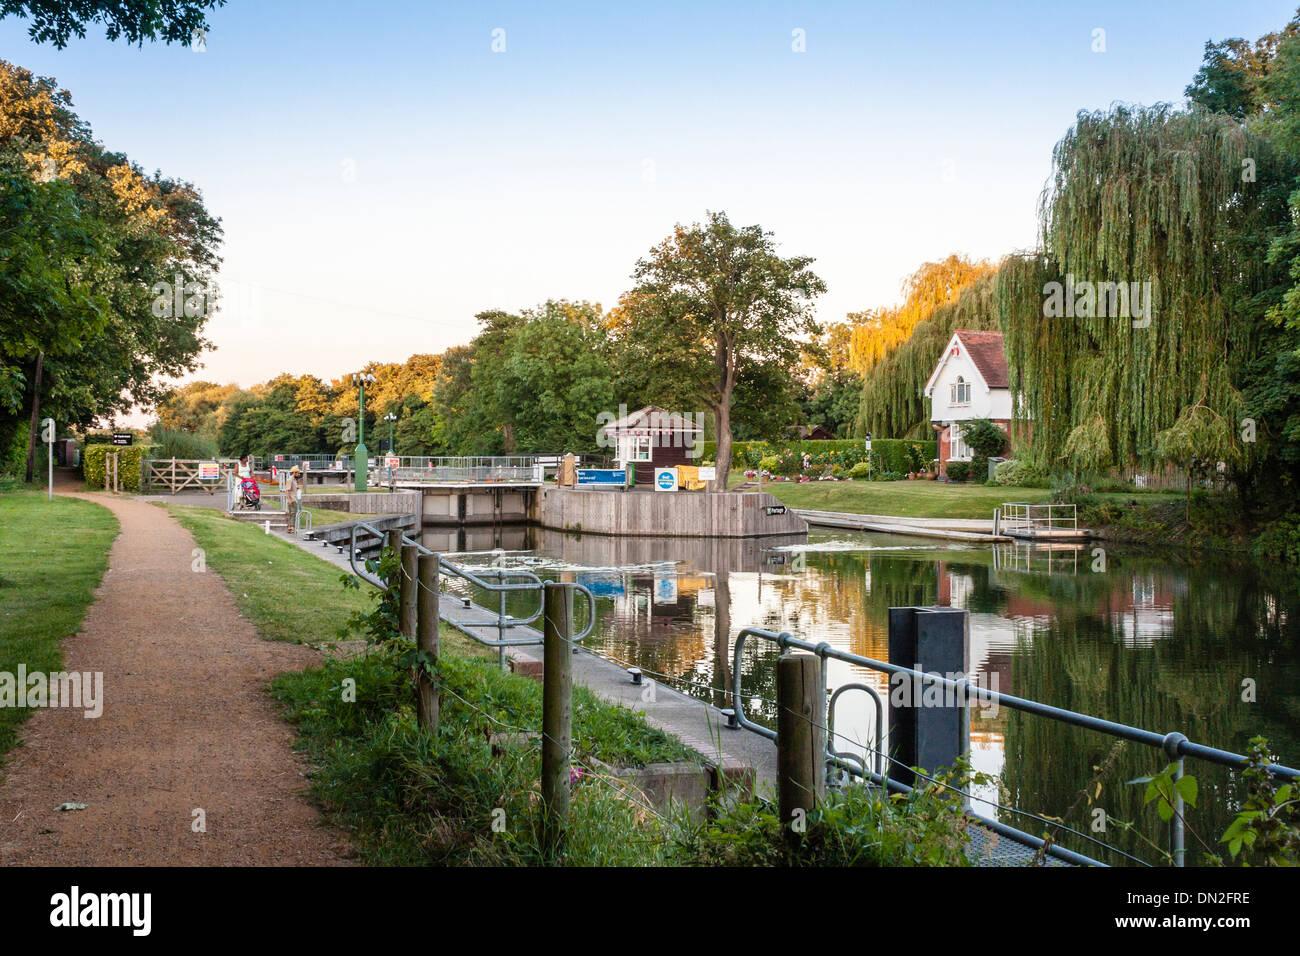 Boveney Lock near Windsor, on the Buckinghamshire bank of the river Thames. Buckinghamshire, England, GB, UK. Stock Photo